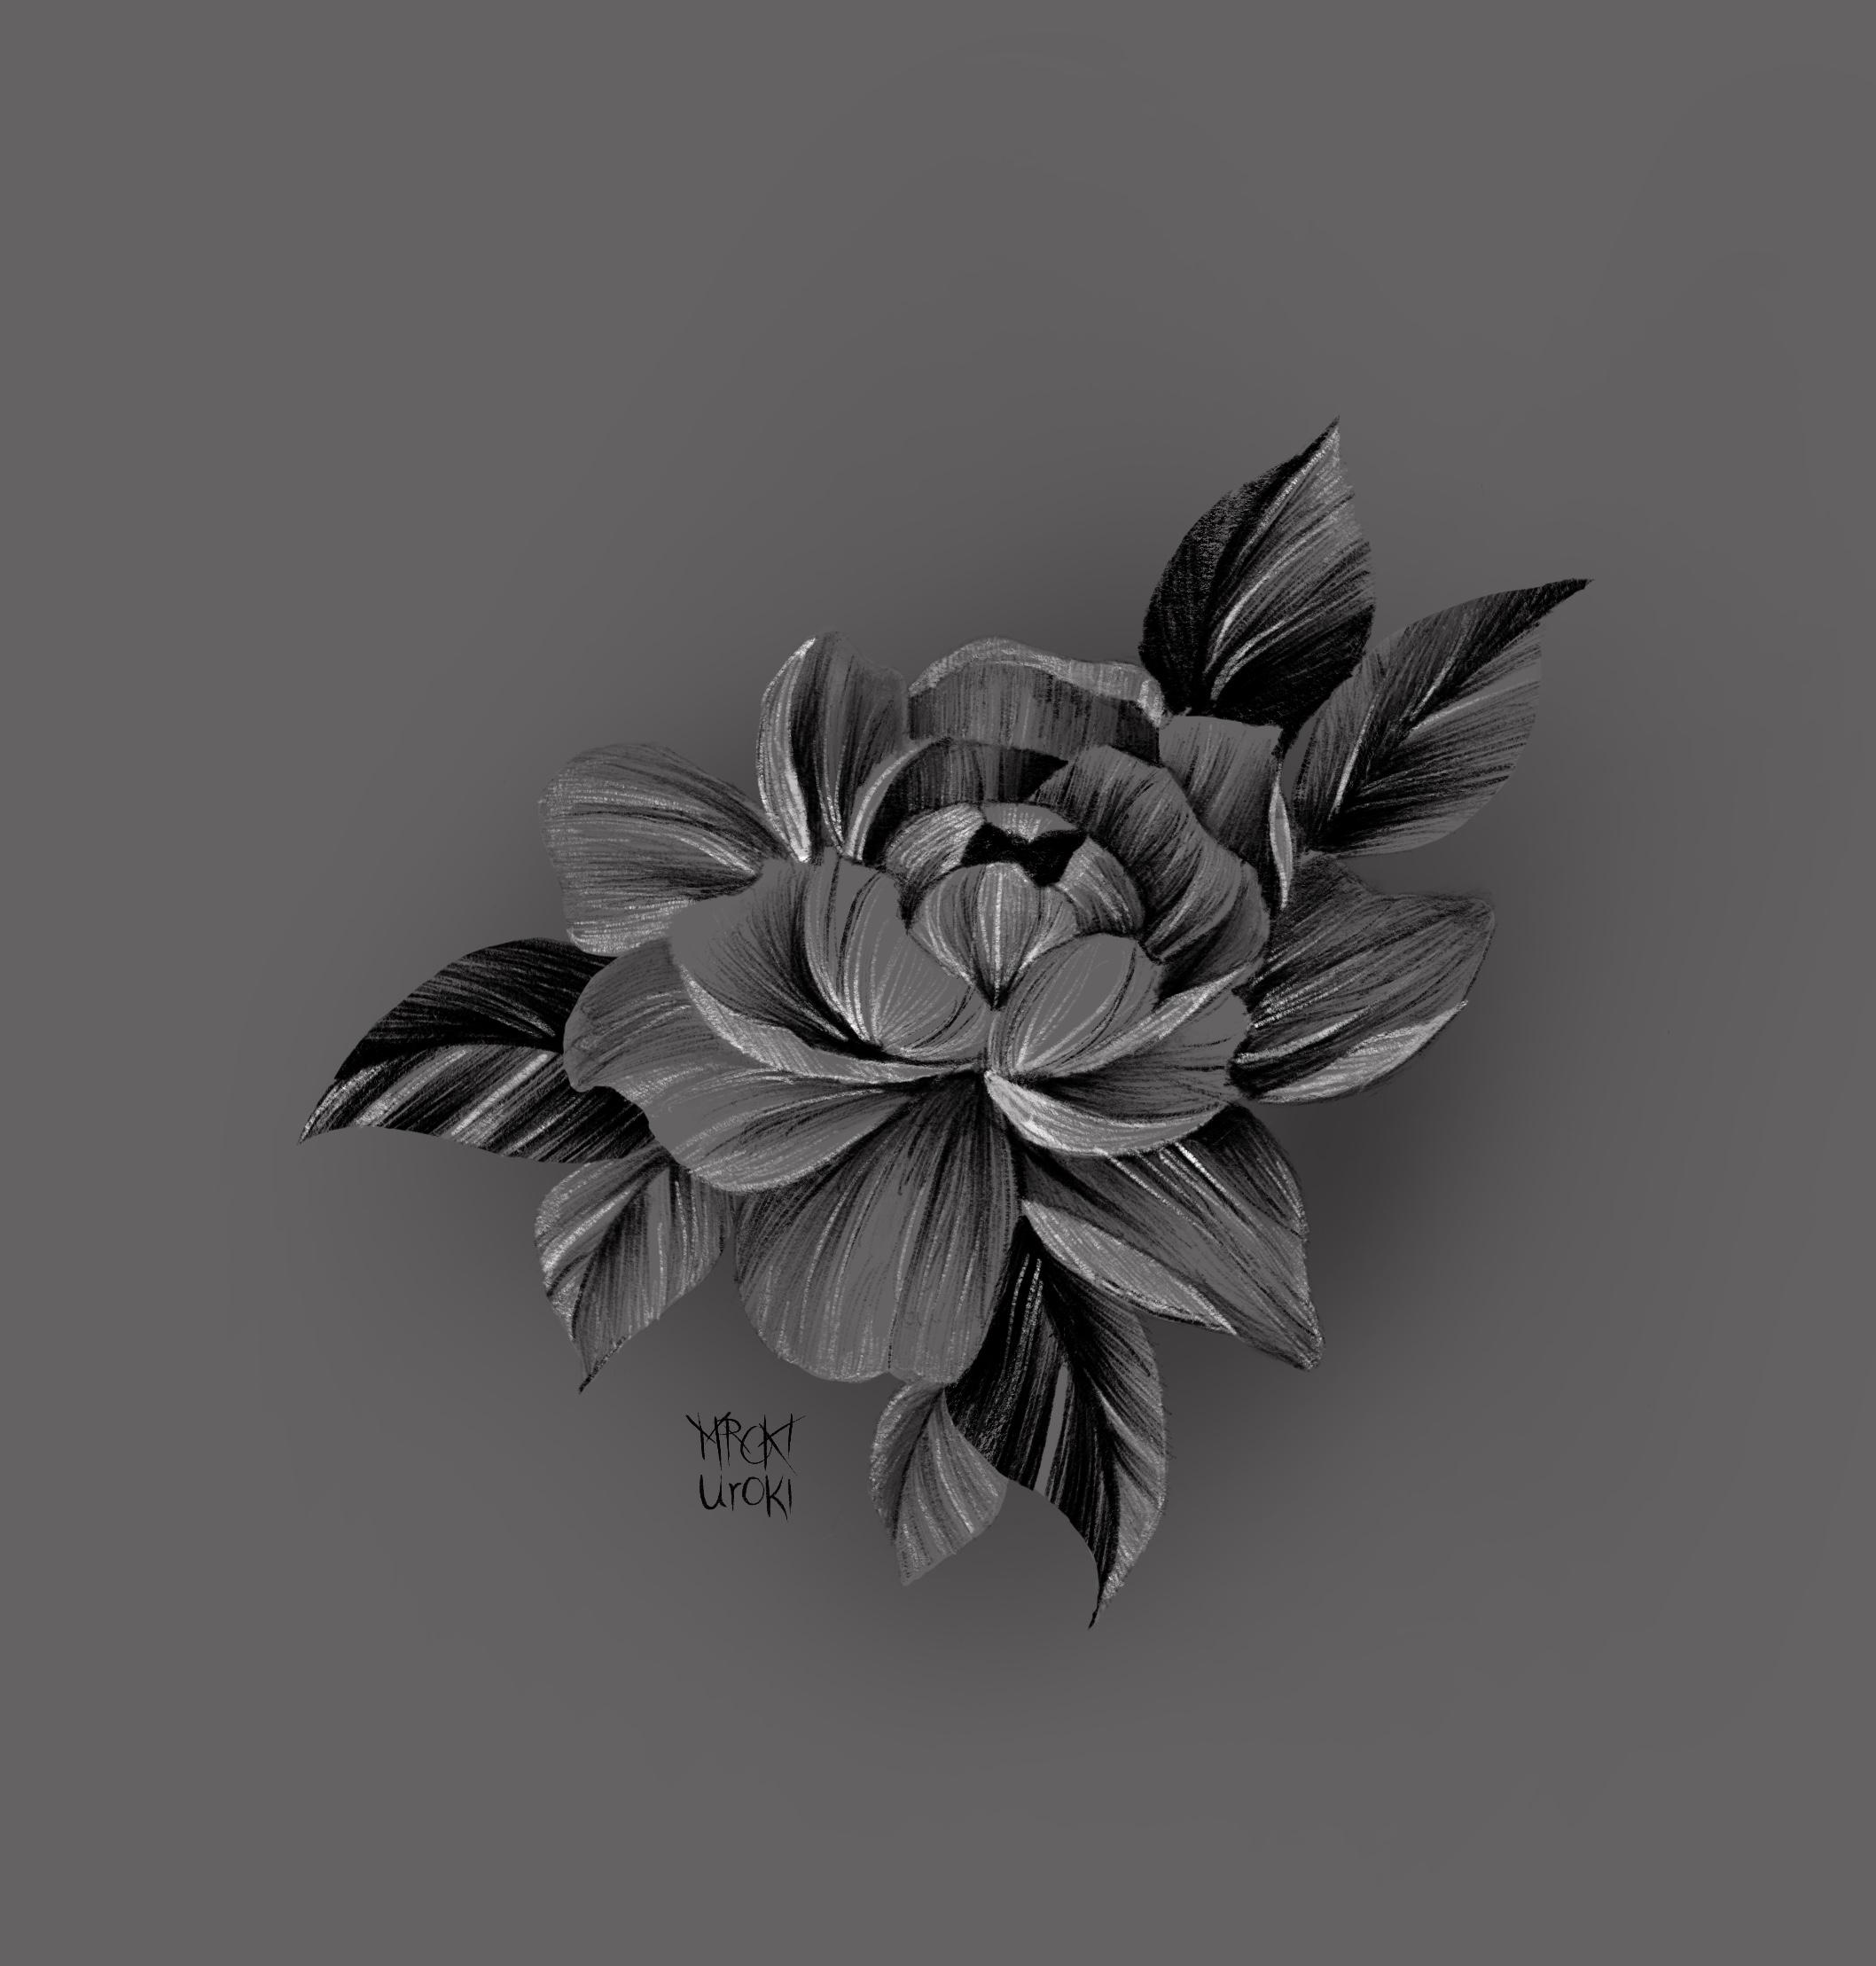 Inksearch tattoo MrokiUroki